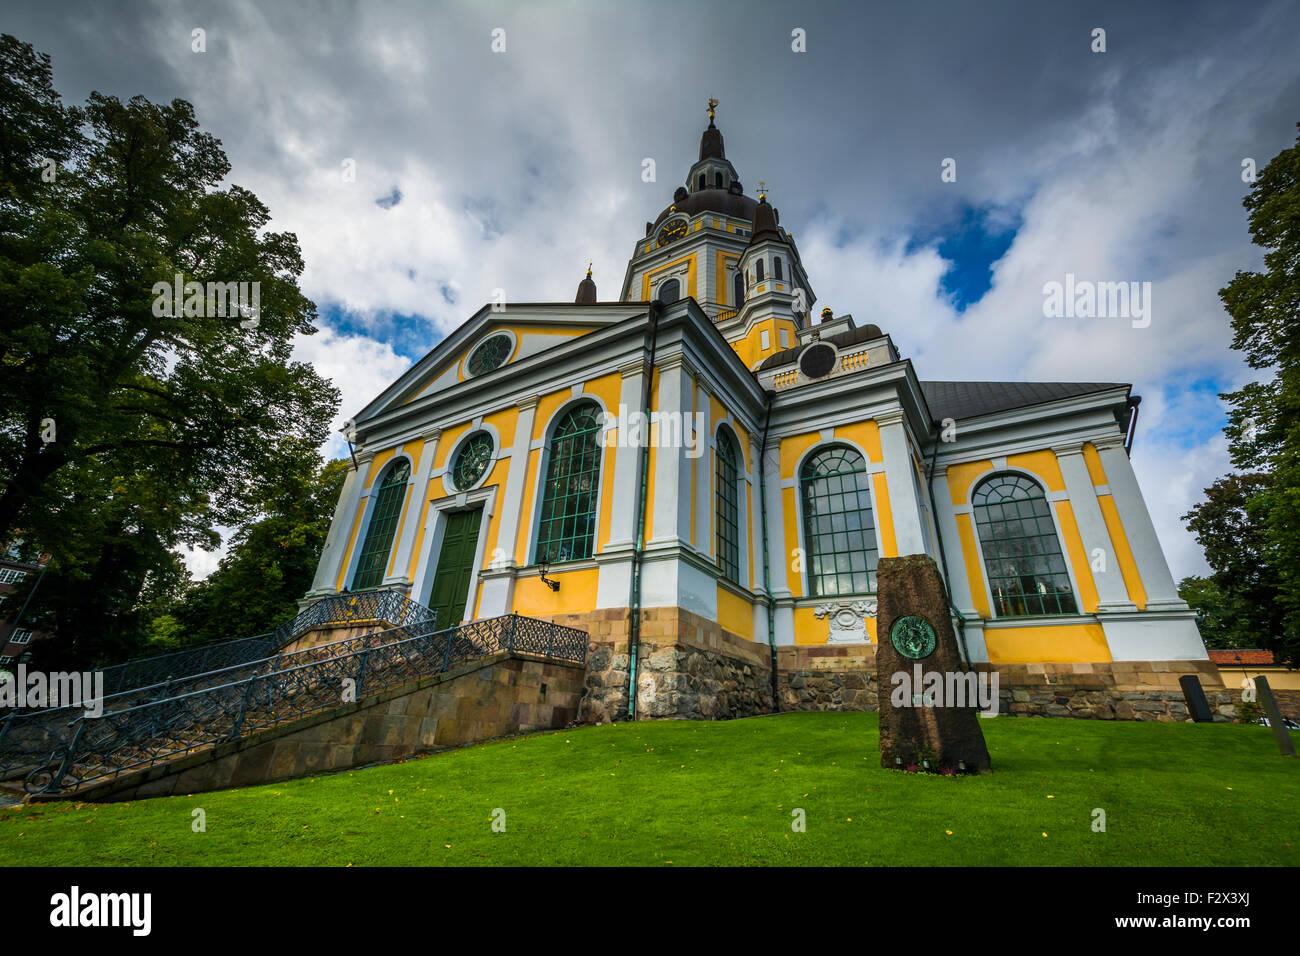 Katarina kyrka, in Södermalm, Stockholm, Sweden. - Stock Image